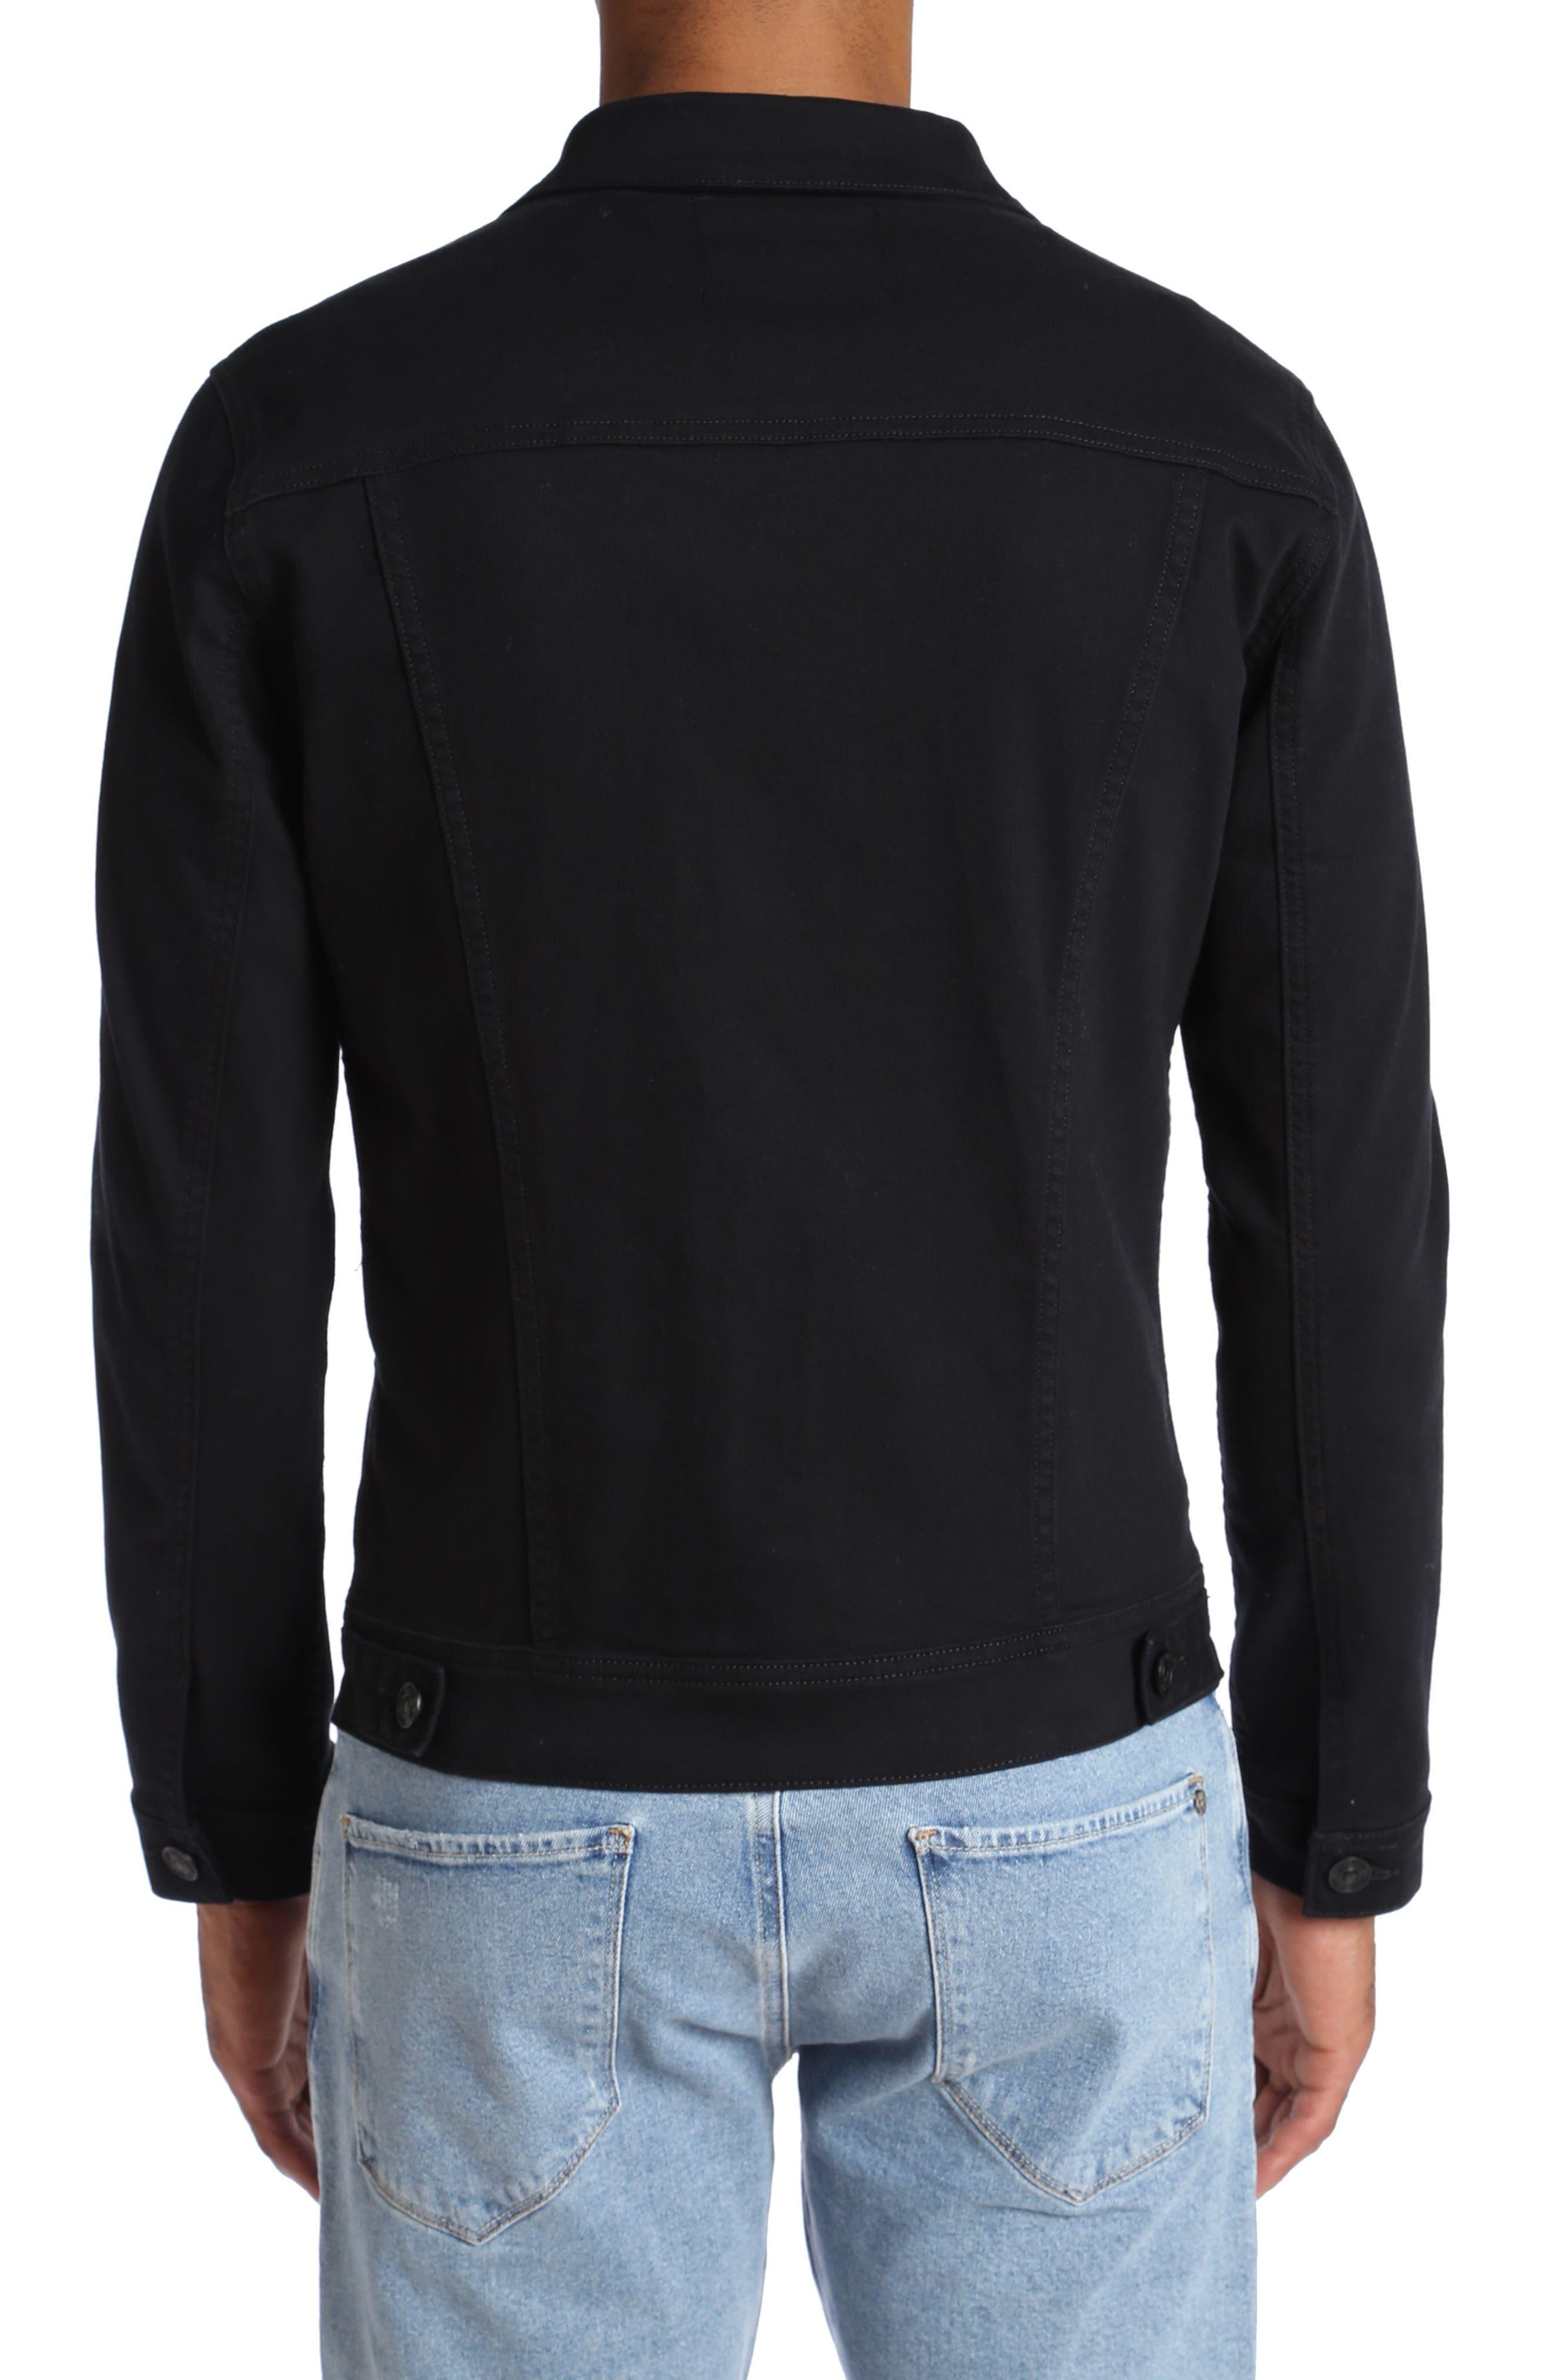 Frank Denim Jacket,                             Alternate thumbnail 2, color,                             Black Comfort